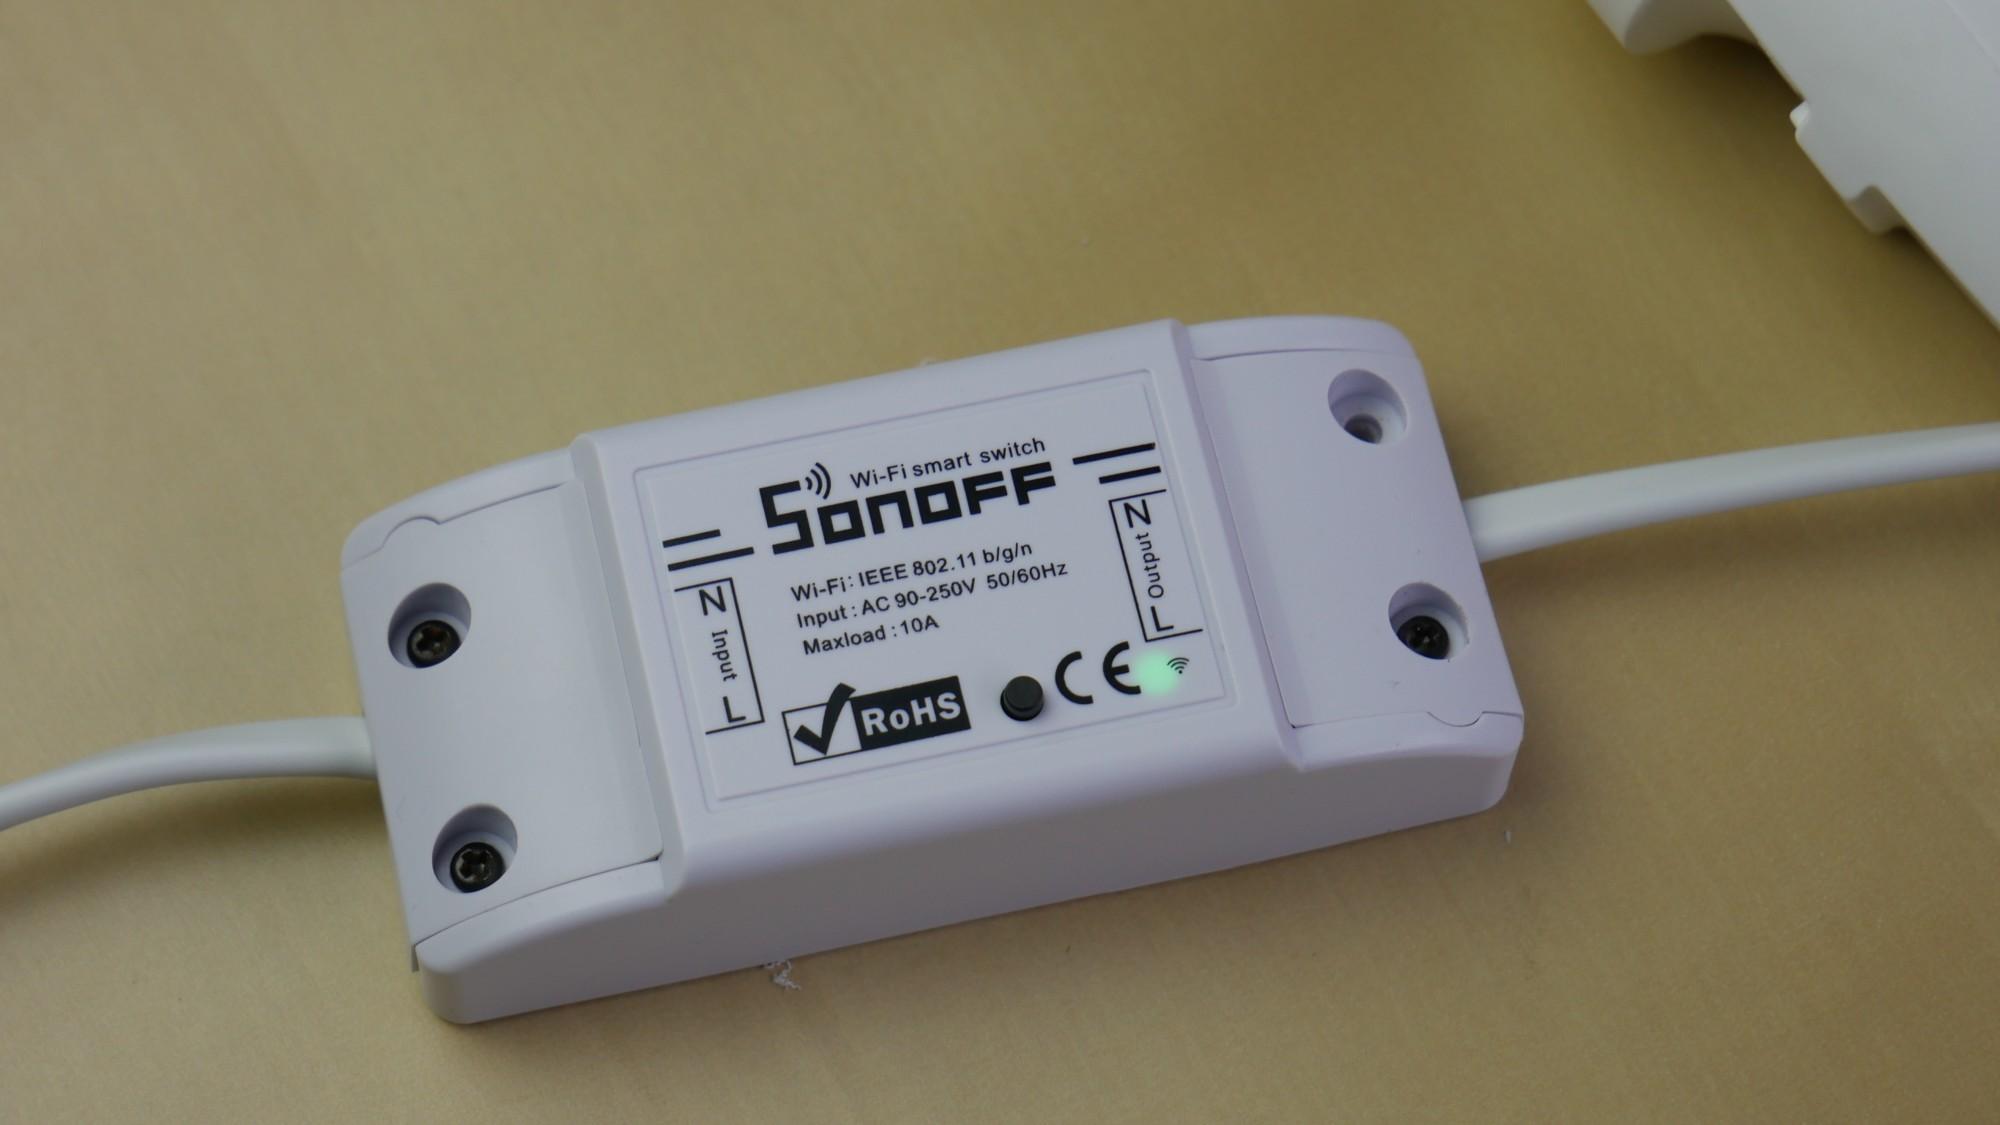 Sonoff Basic WiFi / fot. Kacper Żarski